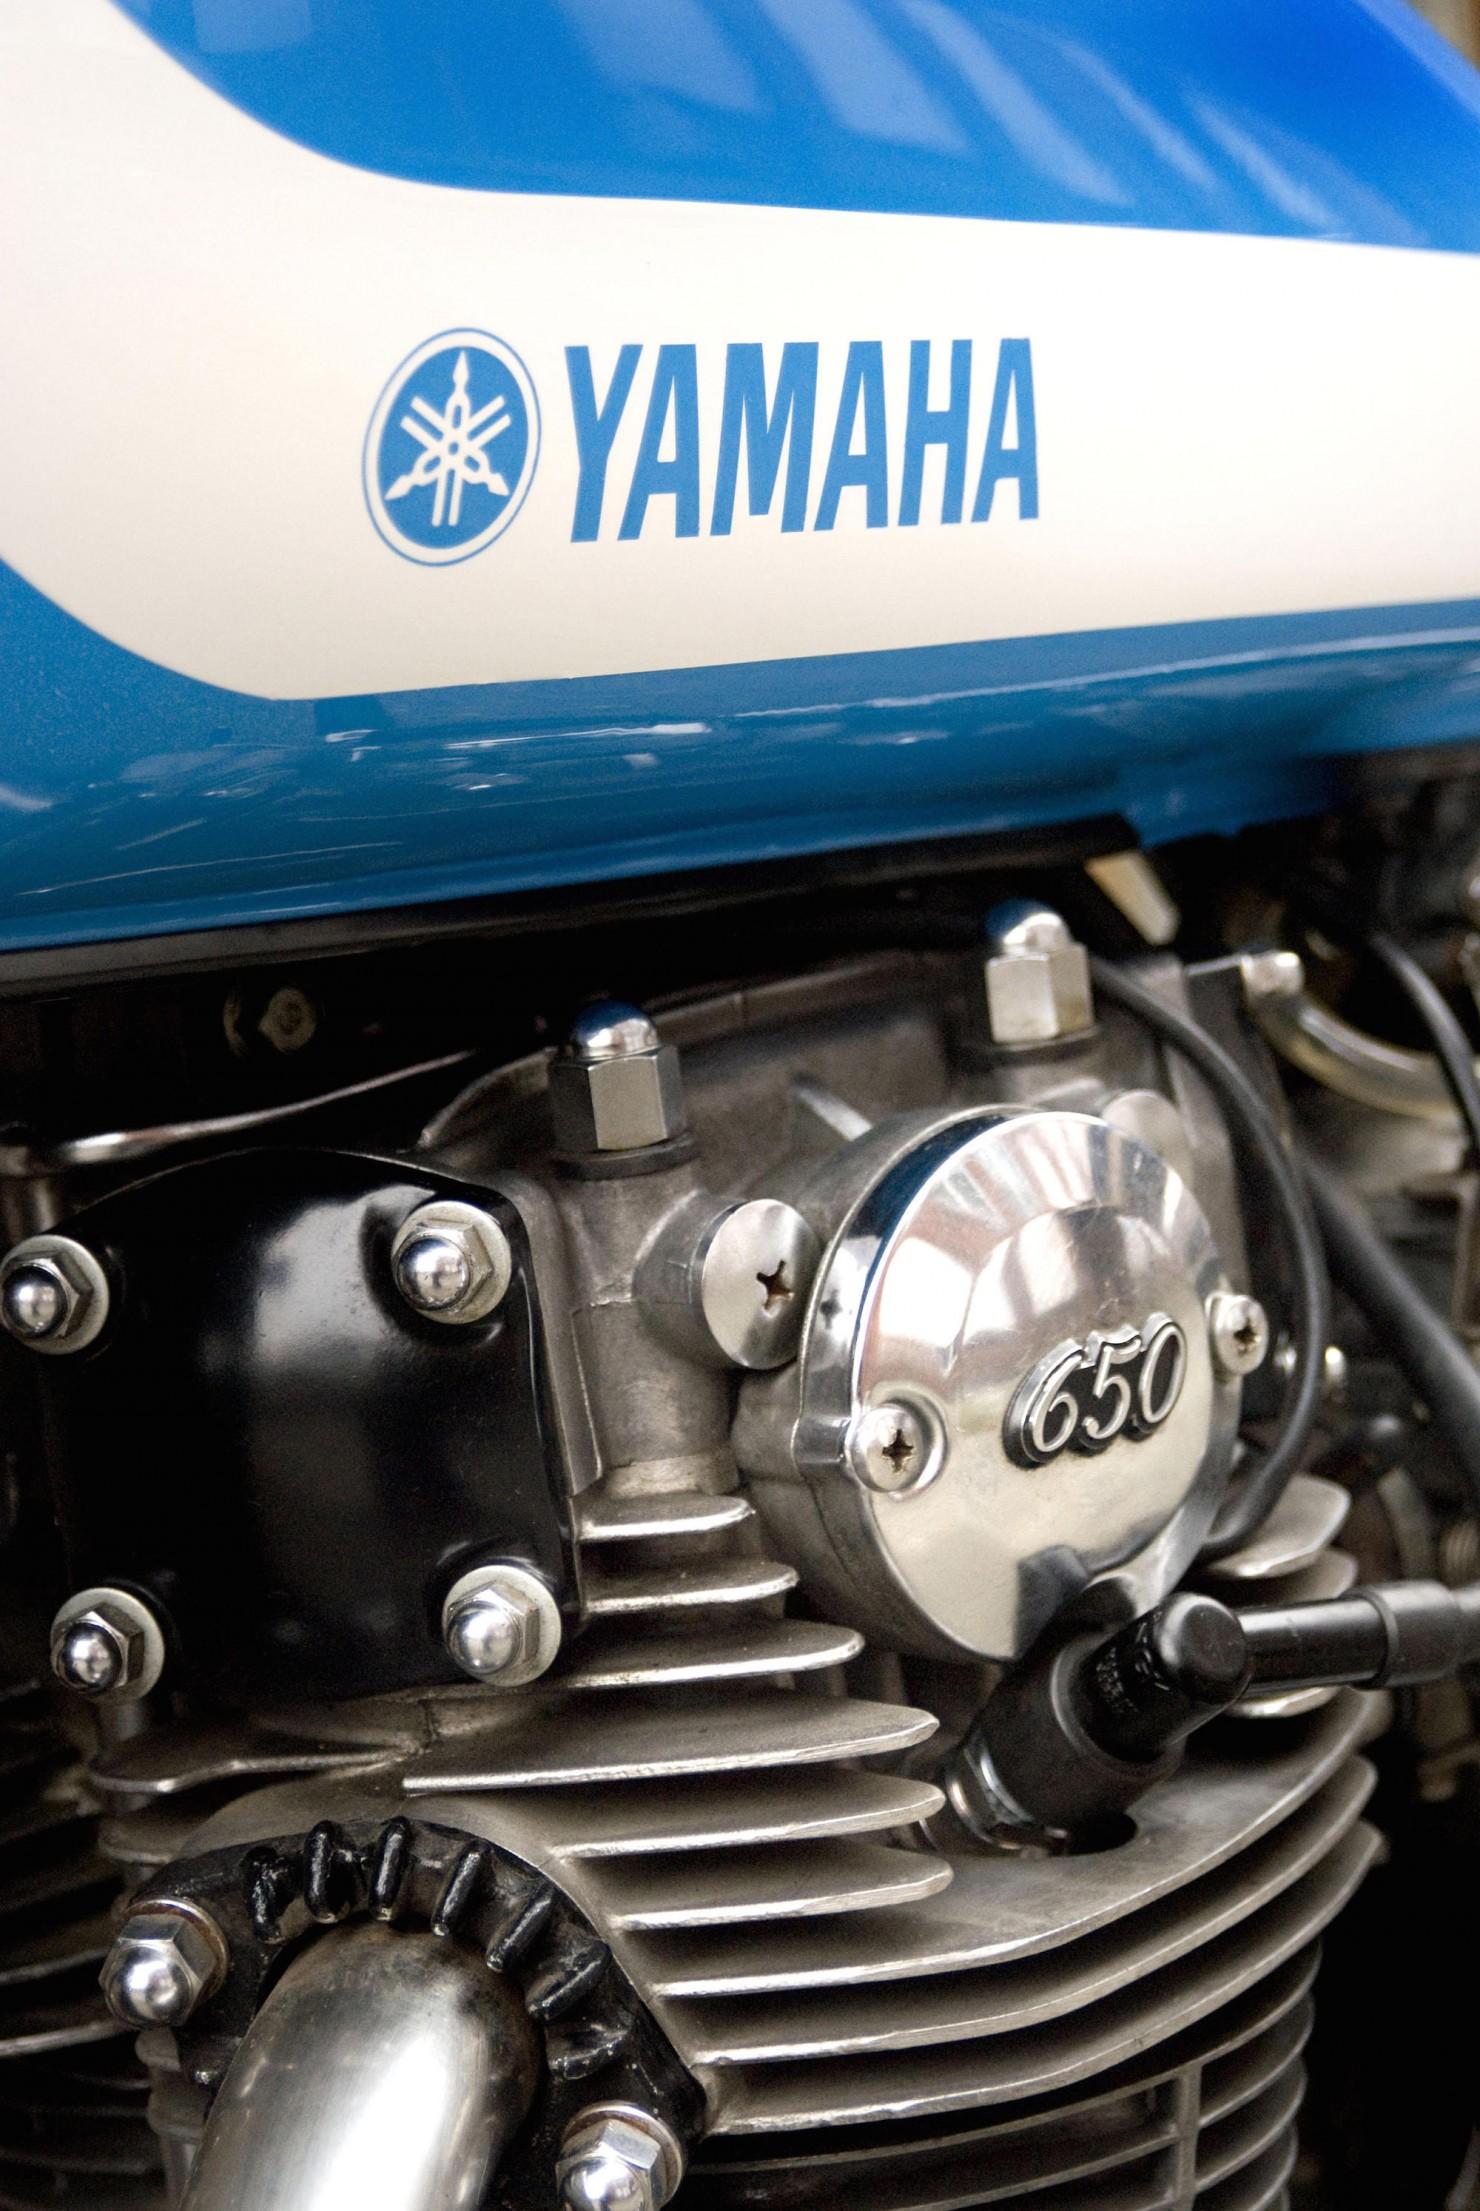 Yamaha XS650 by vintagesteele_9